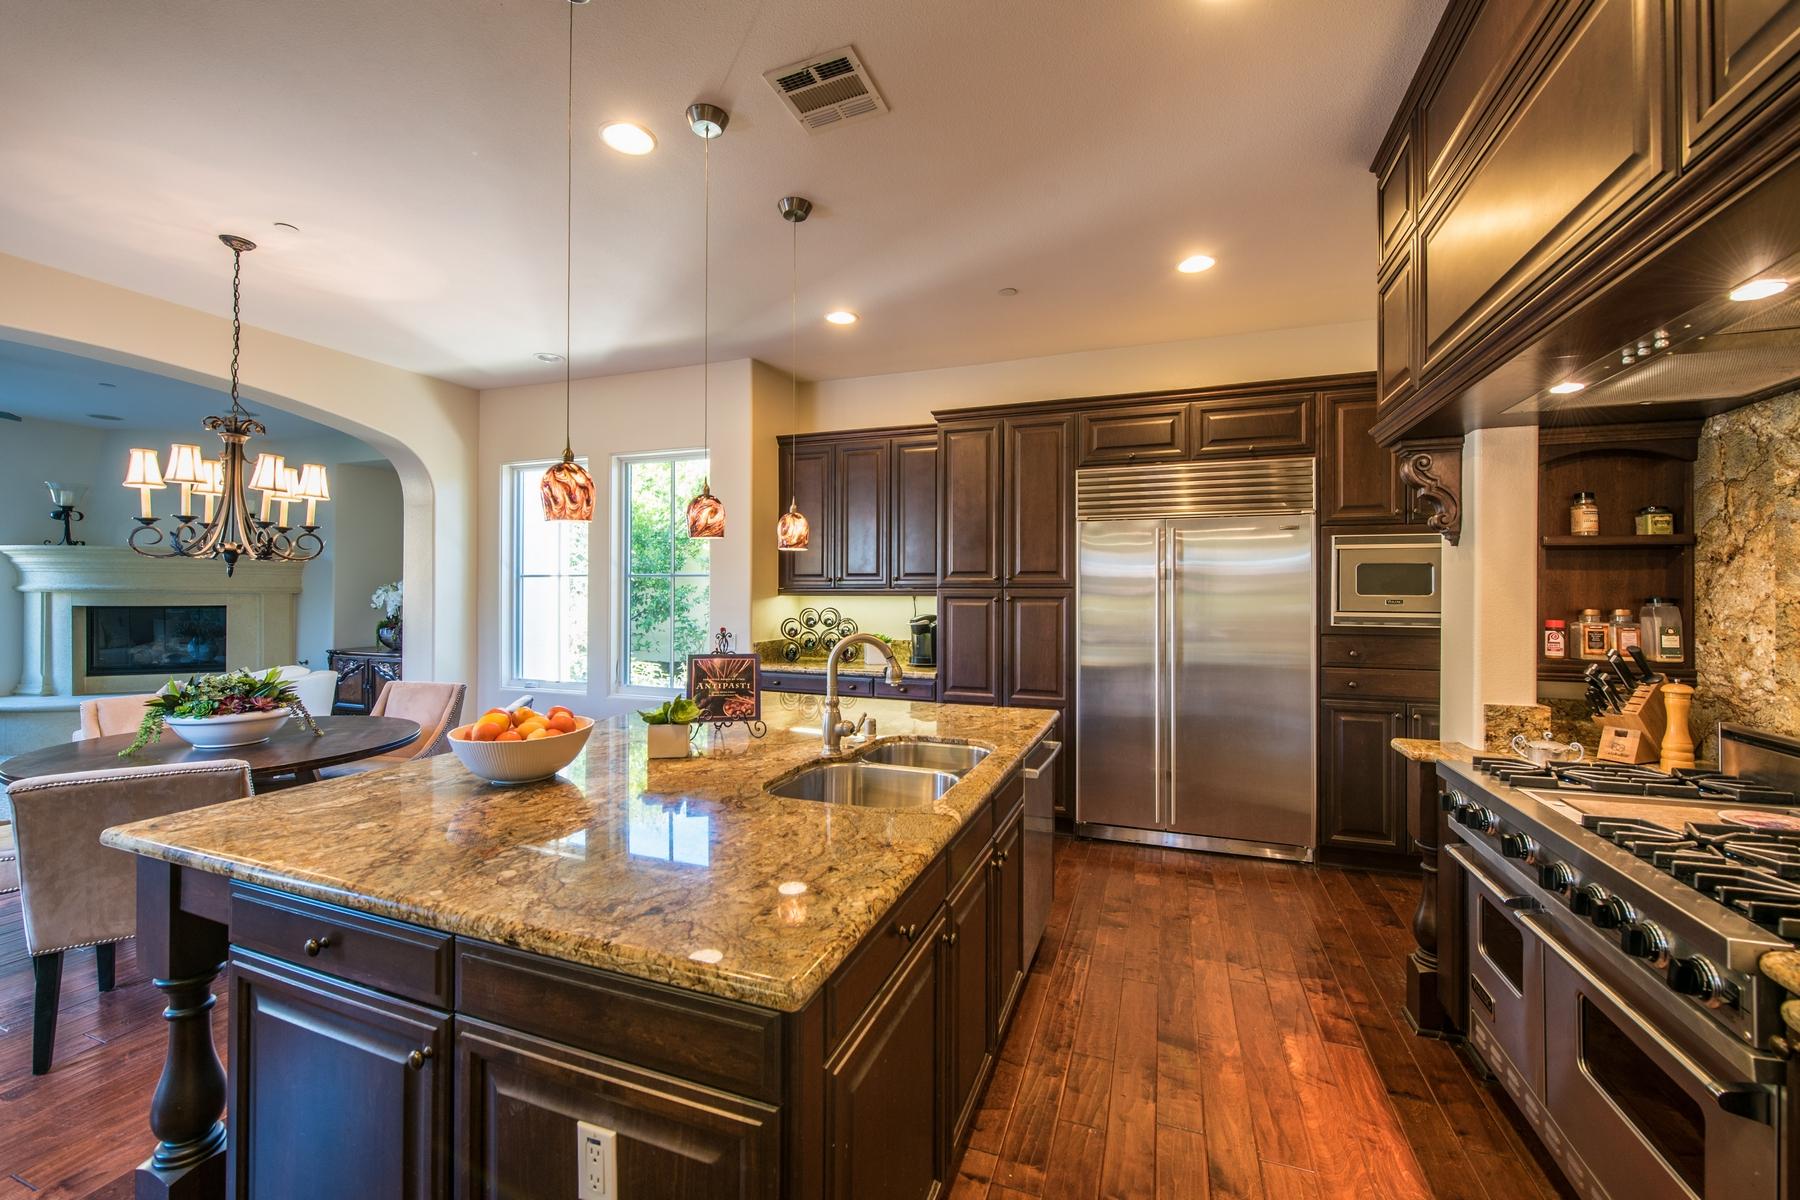 Single Family Home for Sale at 17039 San Antonio Rose Court La Jolla, California, 92127 United States